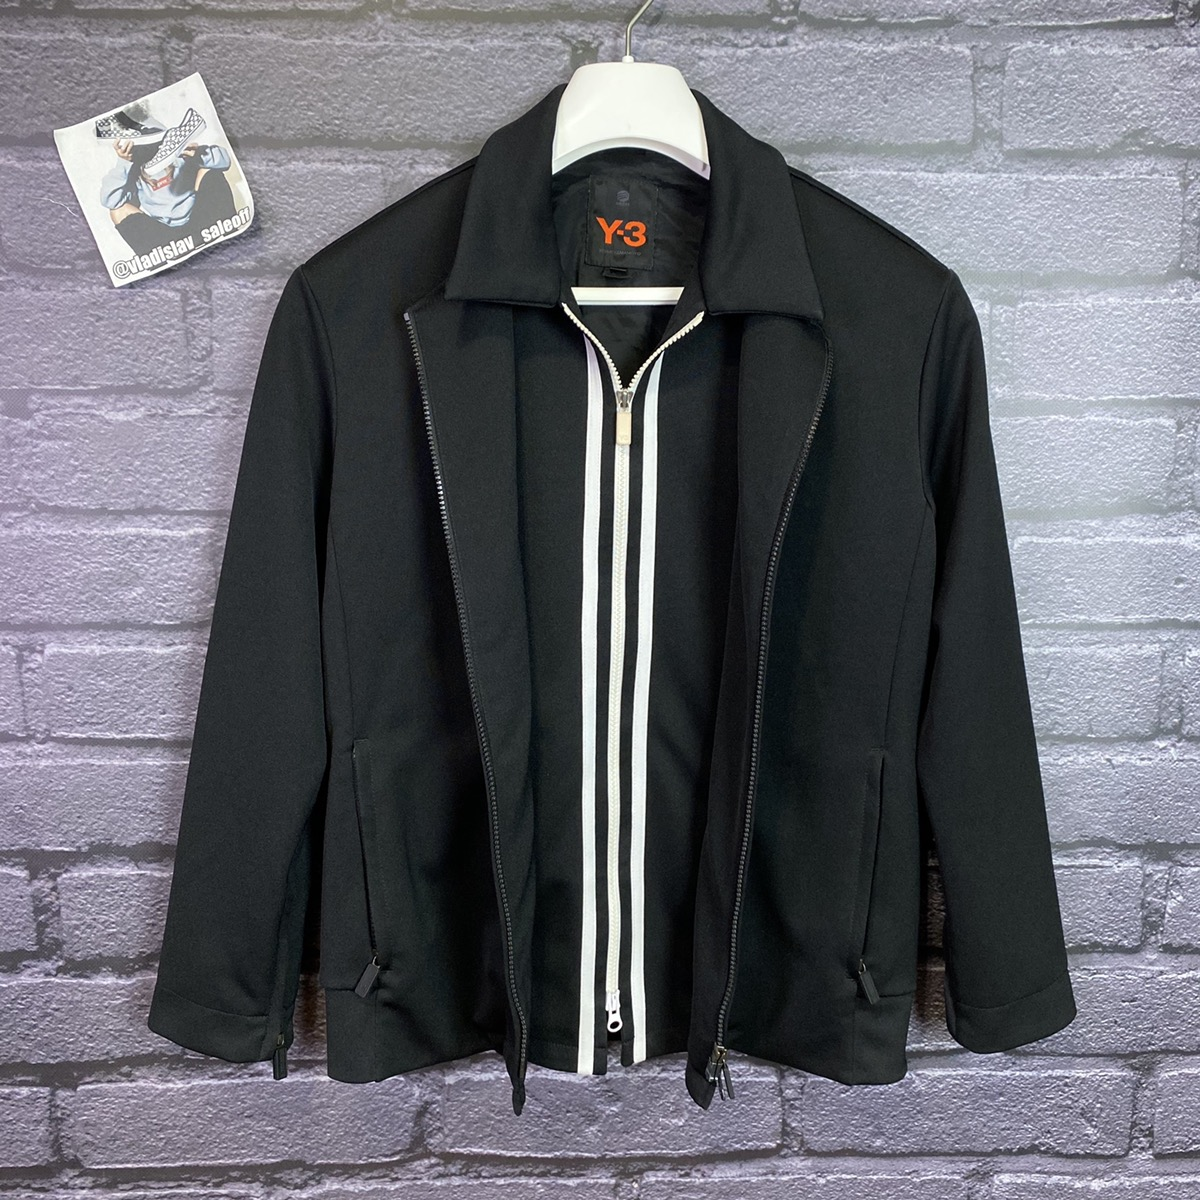 Adidas Ds Adidas Y3 Yohji Yamamoto 05 05 Light Jacket Streetwear Grailed